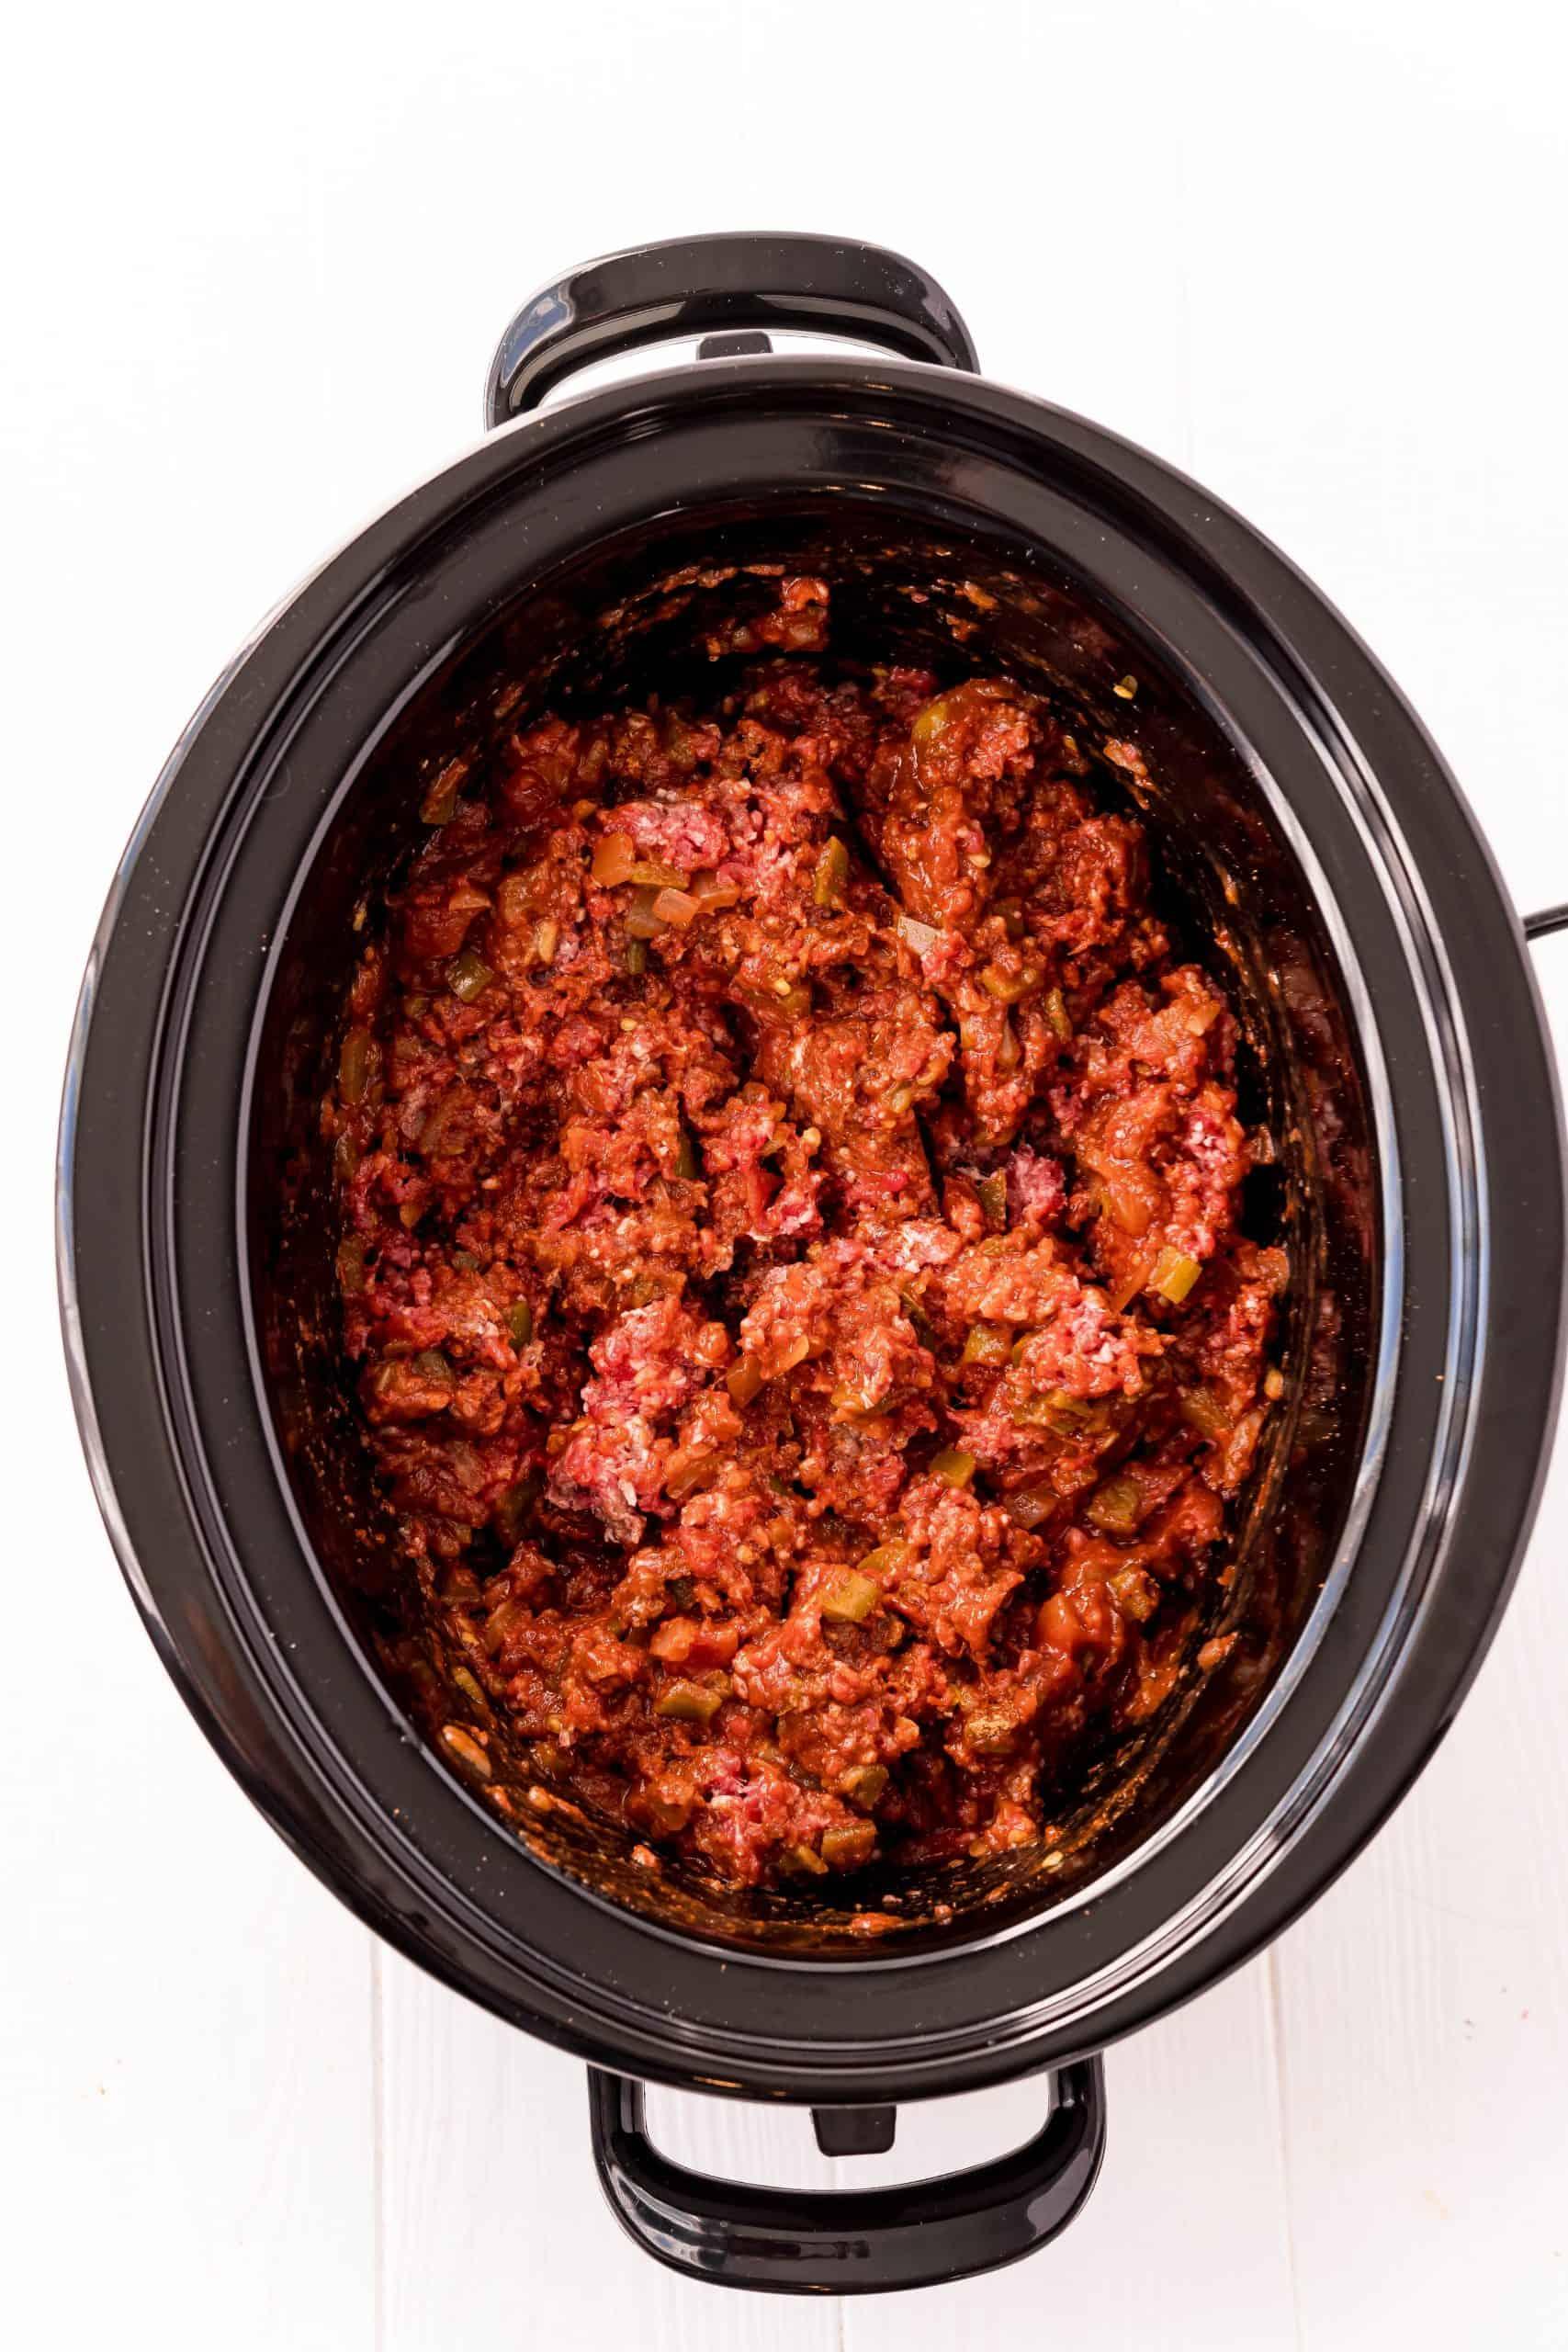 Ground beef added to black crock pot